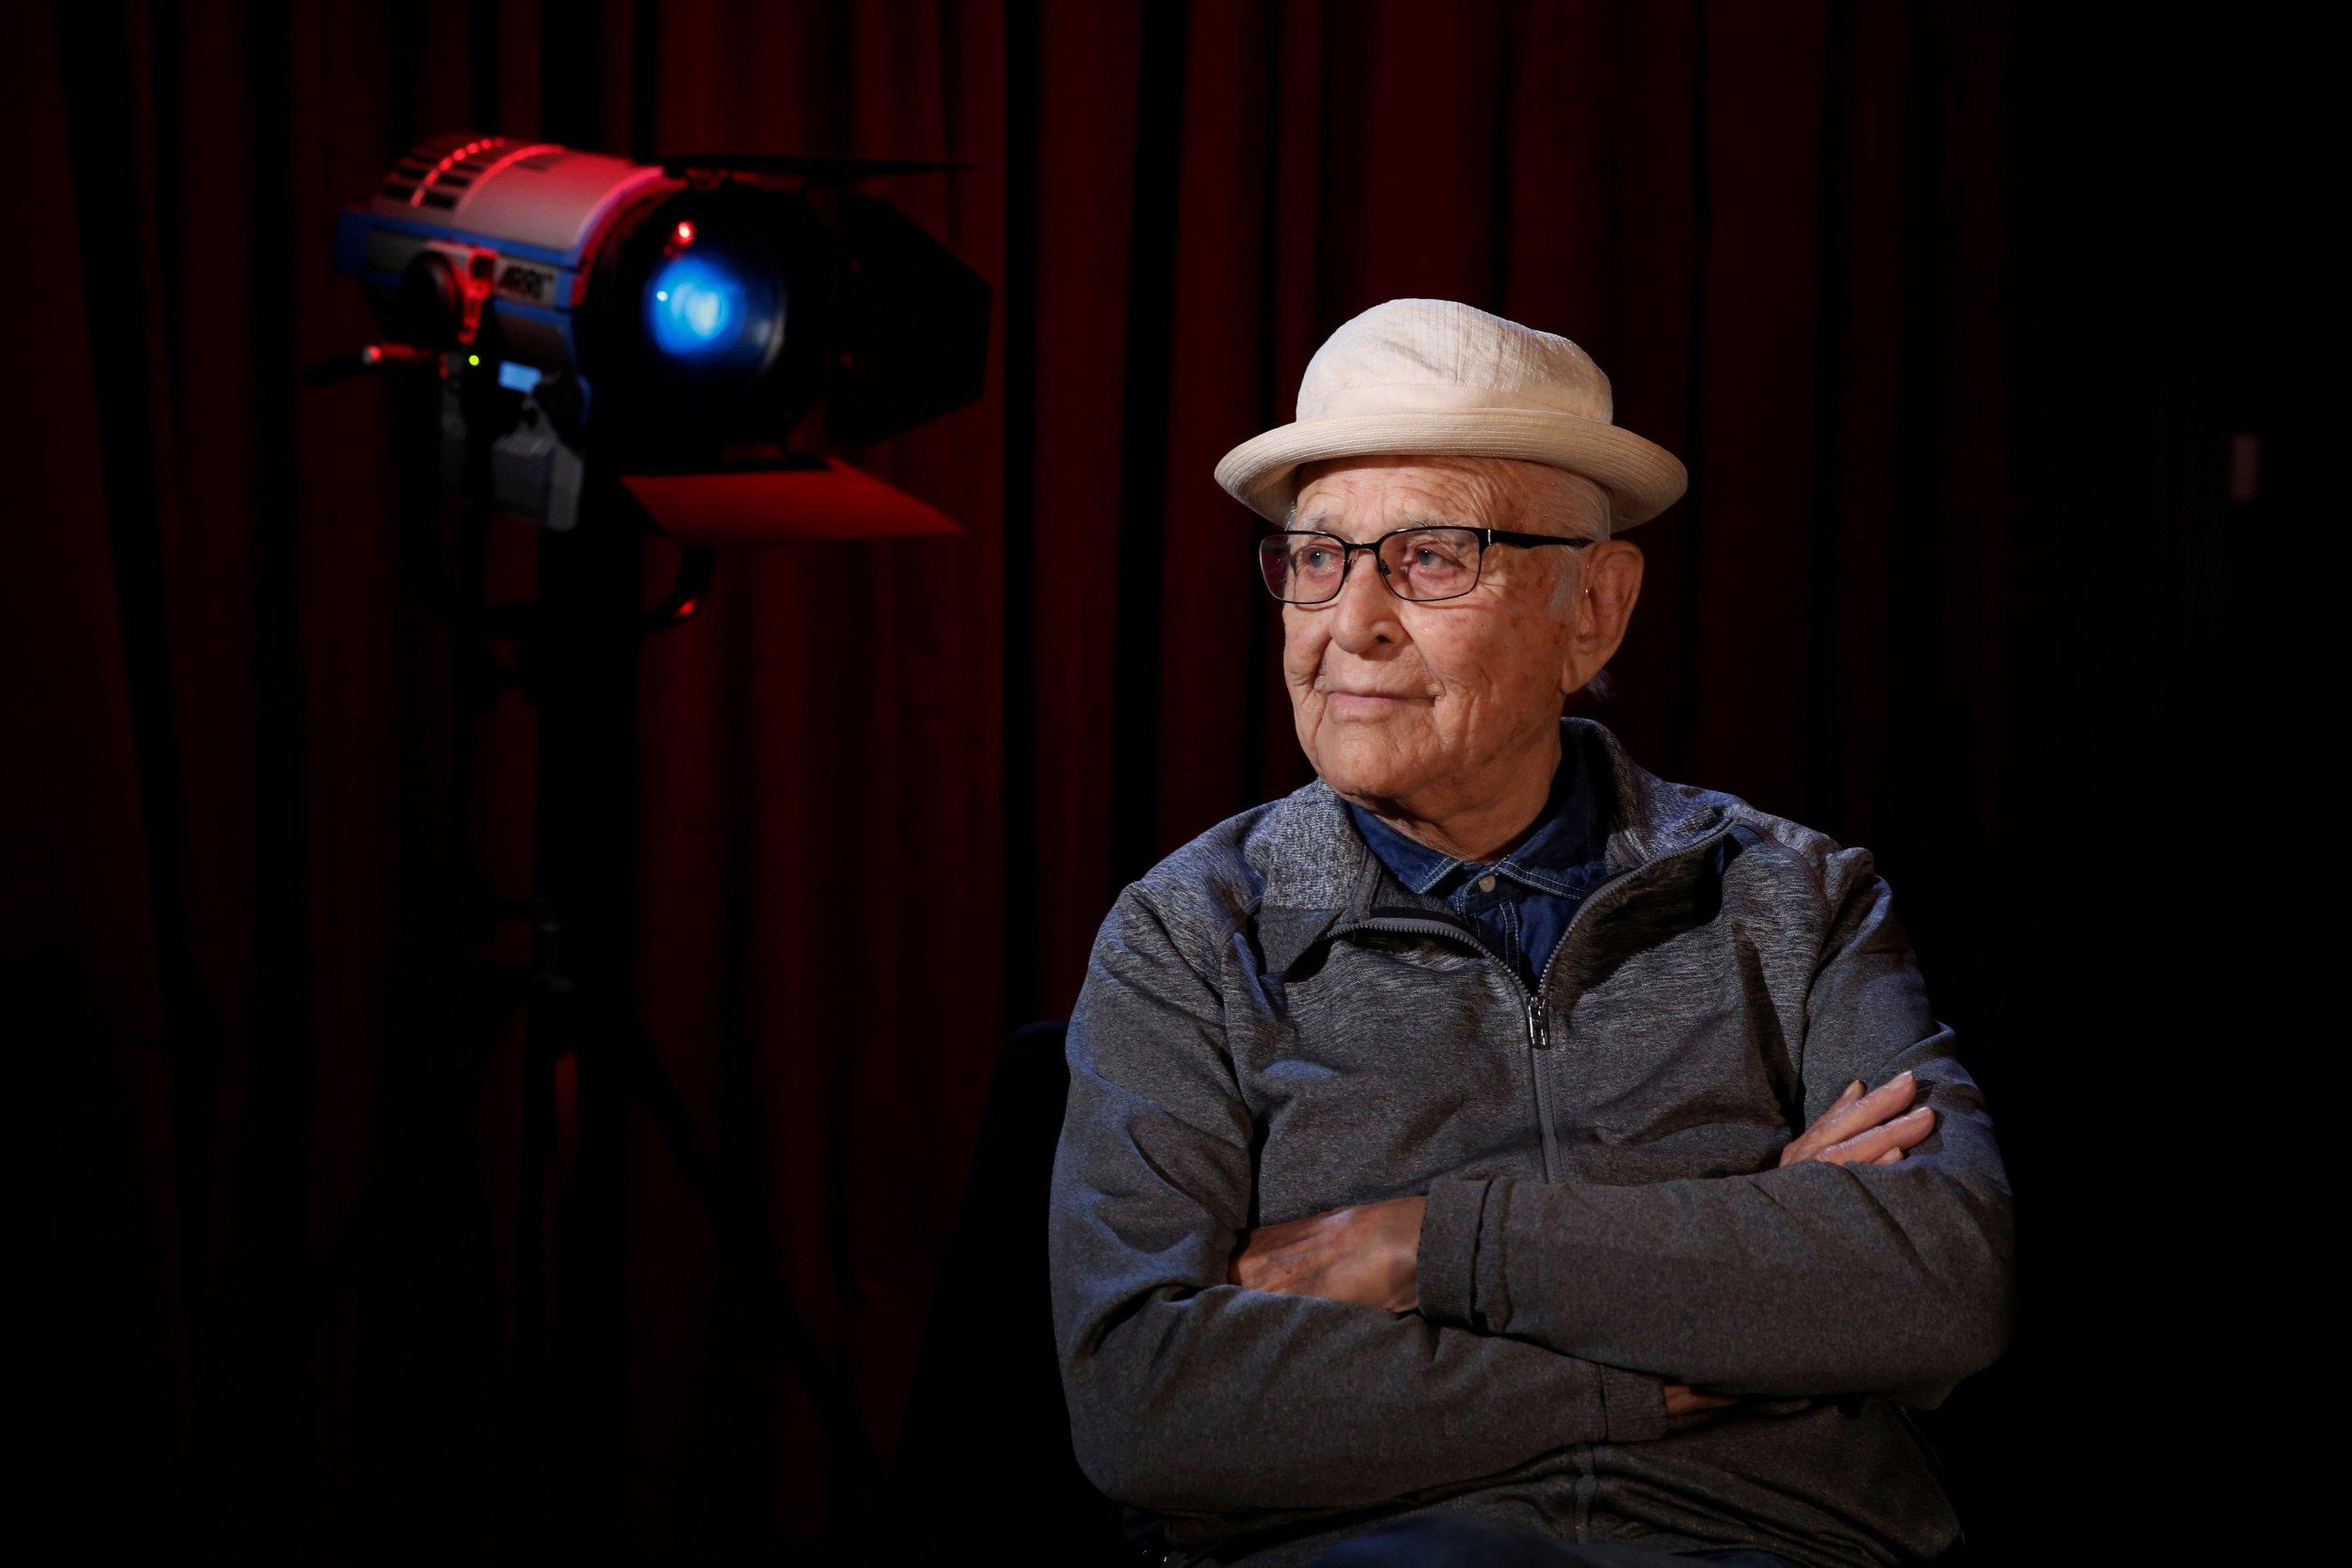 8-4-17 Norman Lear